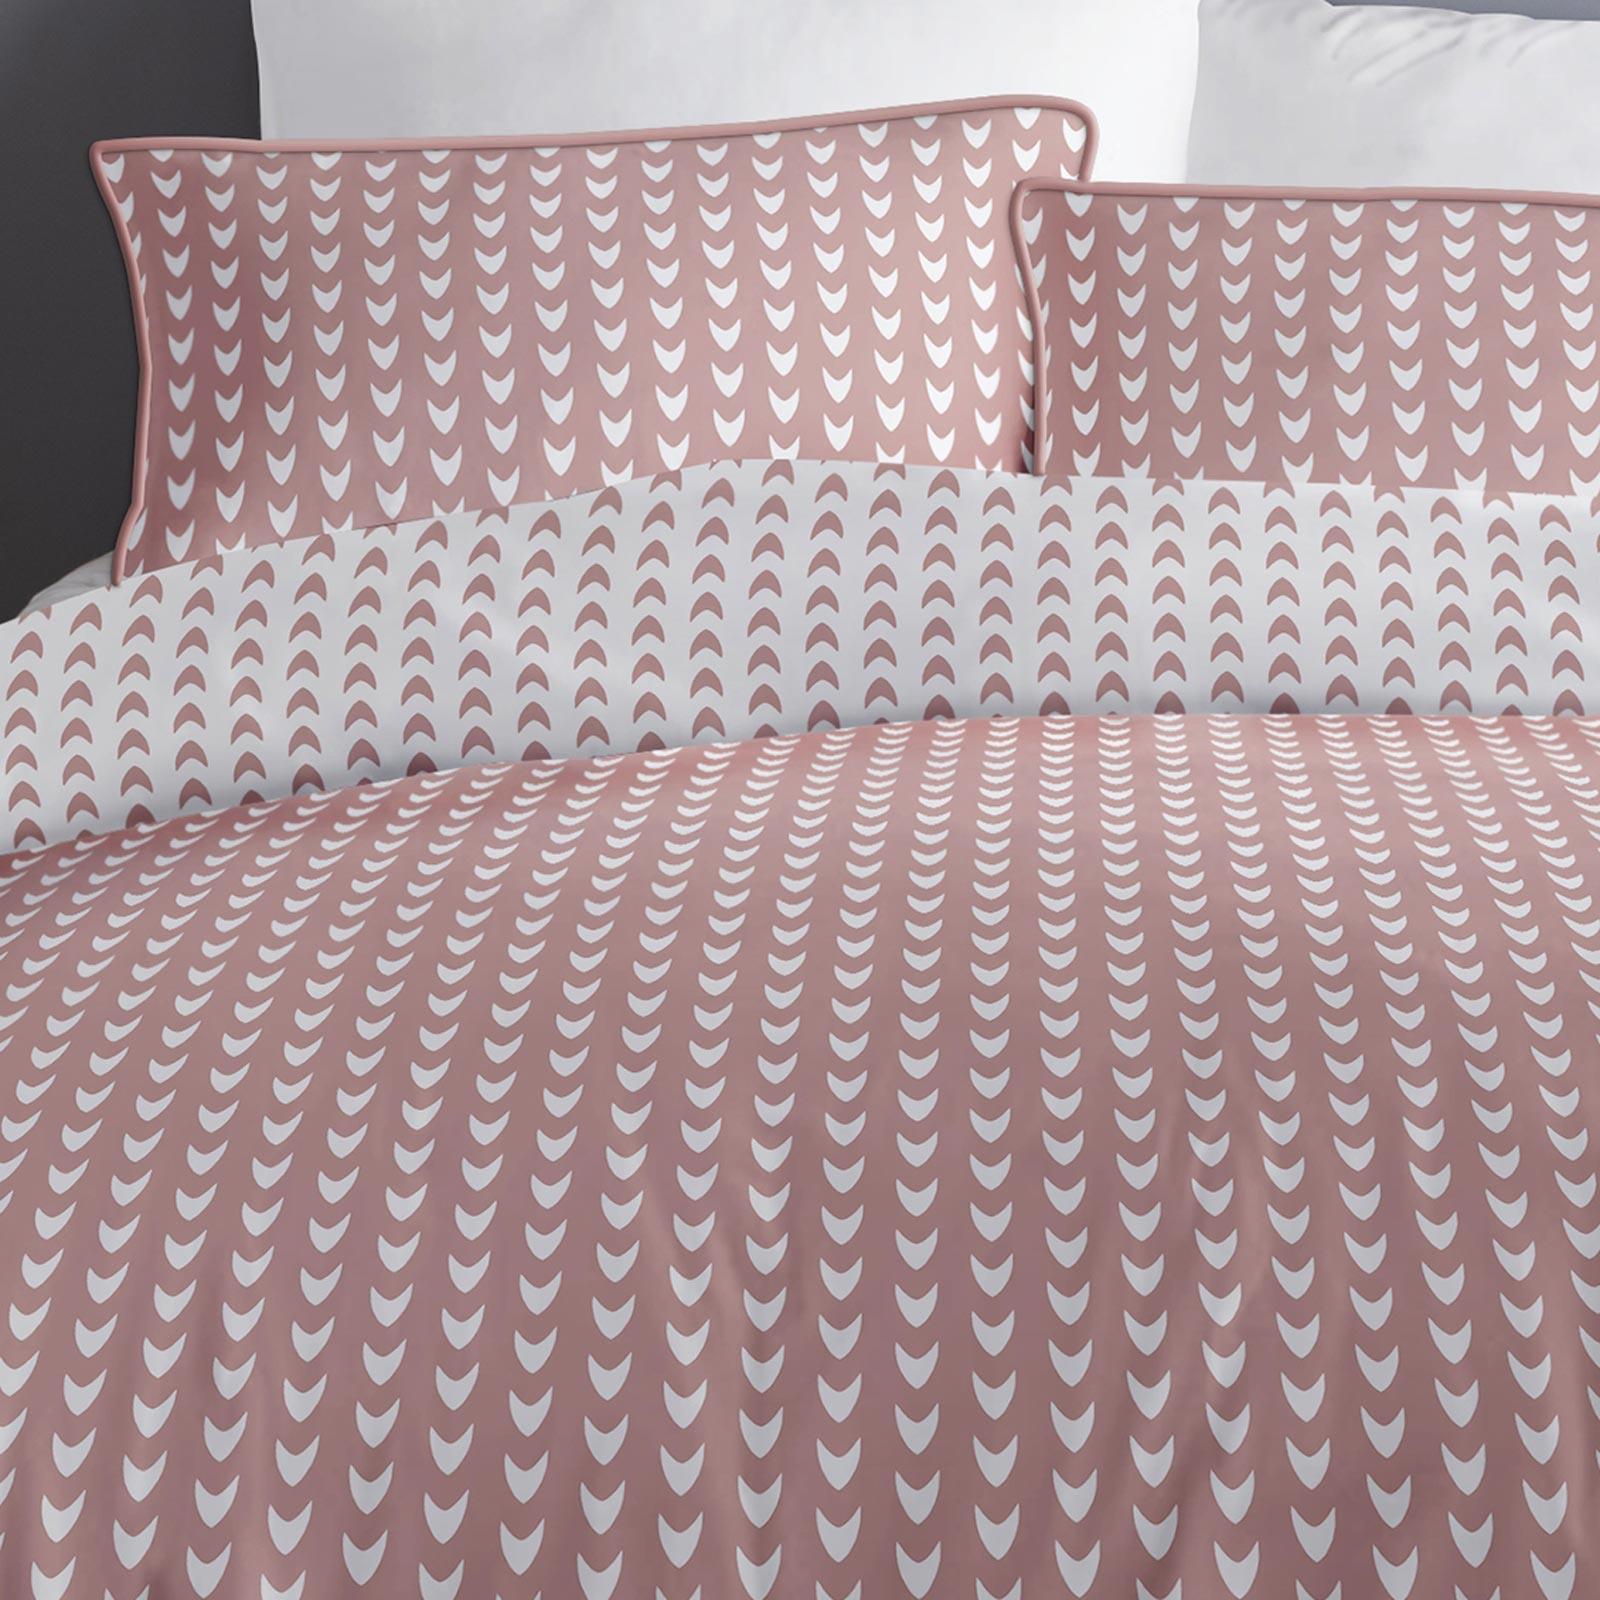 Blush-fundas-nordicas-Rosa-Geometrico-100-Algodon-Edredon-Reversible-conjuntos-de-cama miniatura 12